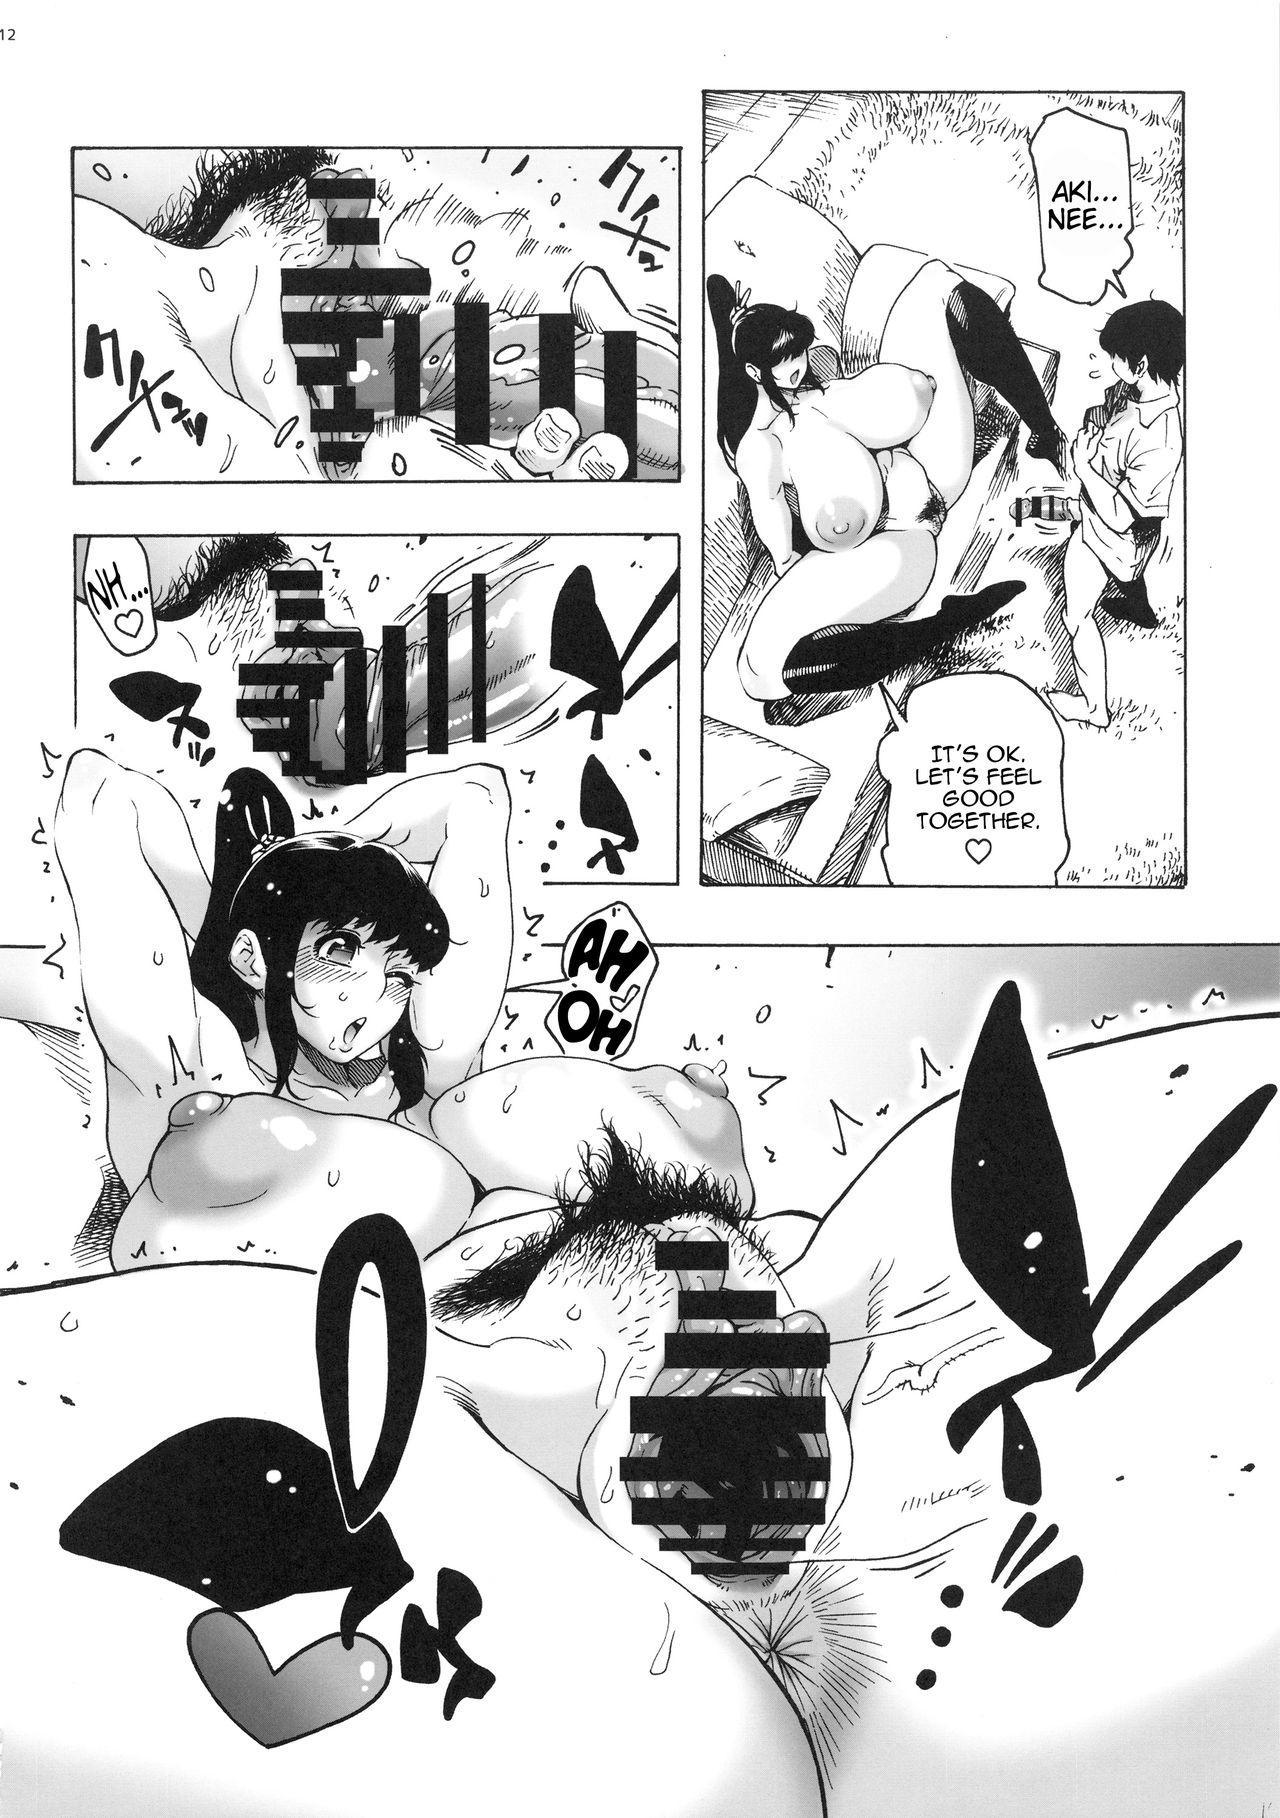 Osananajimi wa, JK Ponyta | My Childhood Friend is a Ponytailed High School Girl 12